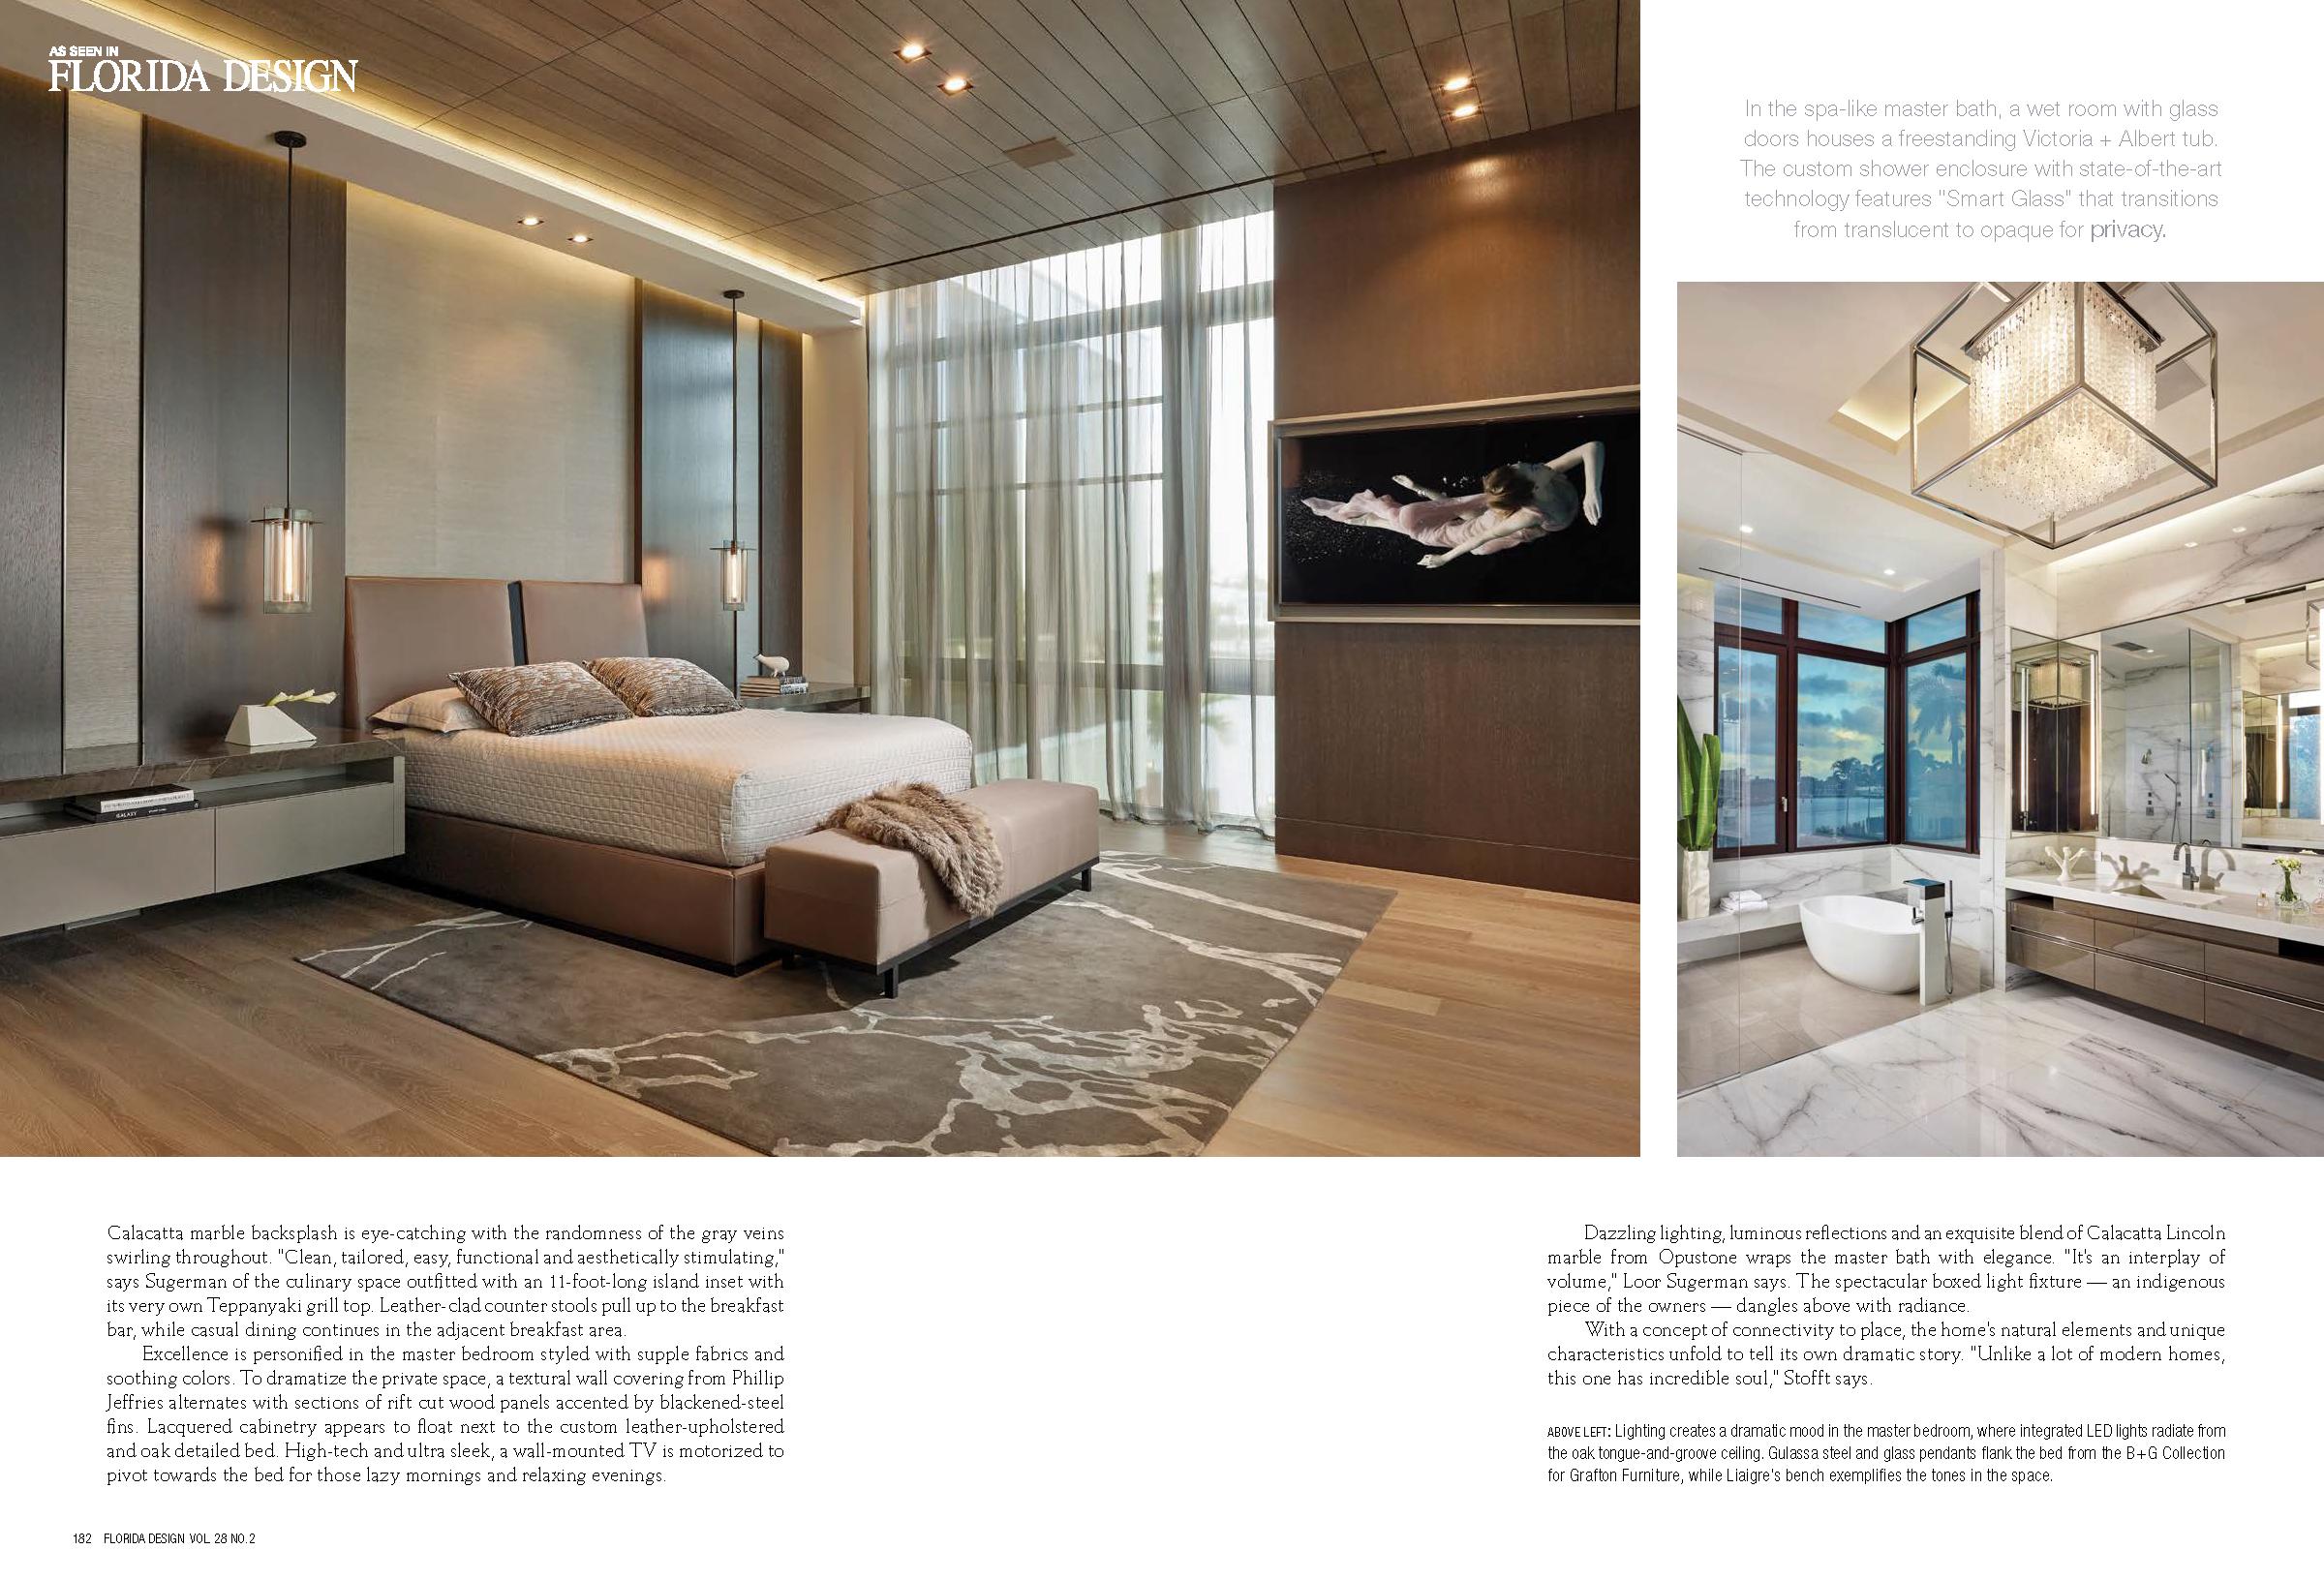 B&G-Design_Berman_FD281_as-seen-in_Page_5.png